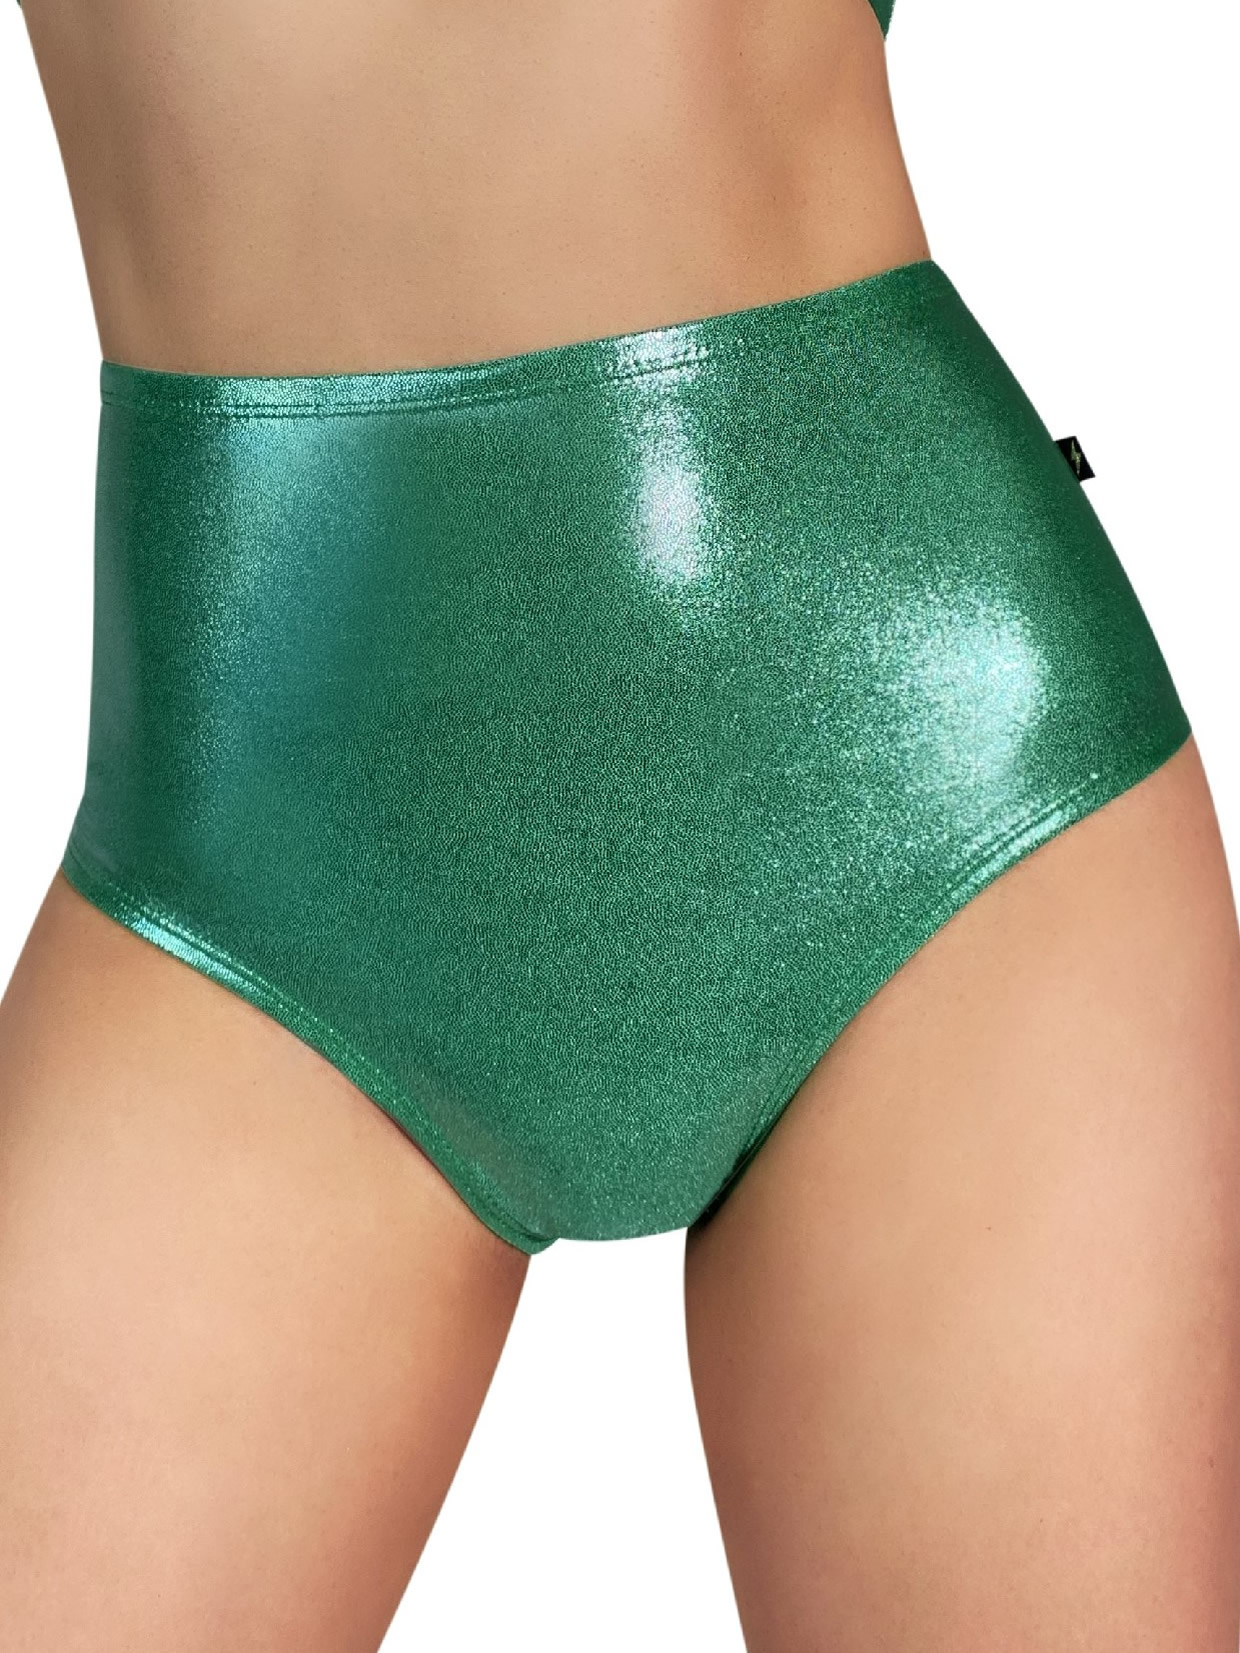 Cleo The Hurricane Metallic High Waisted Hot Pants - Mint Green